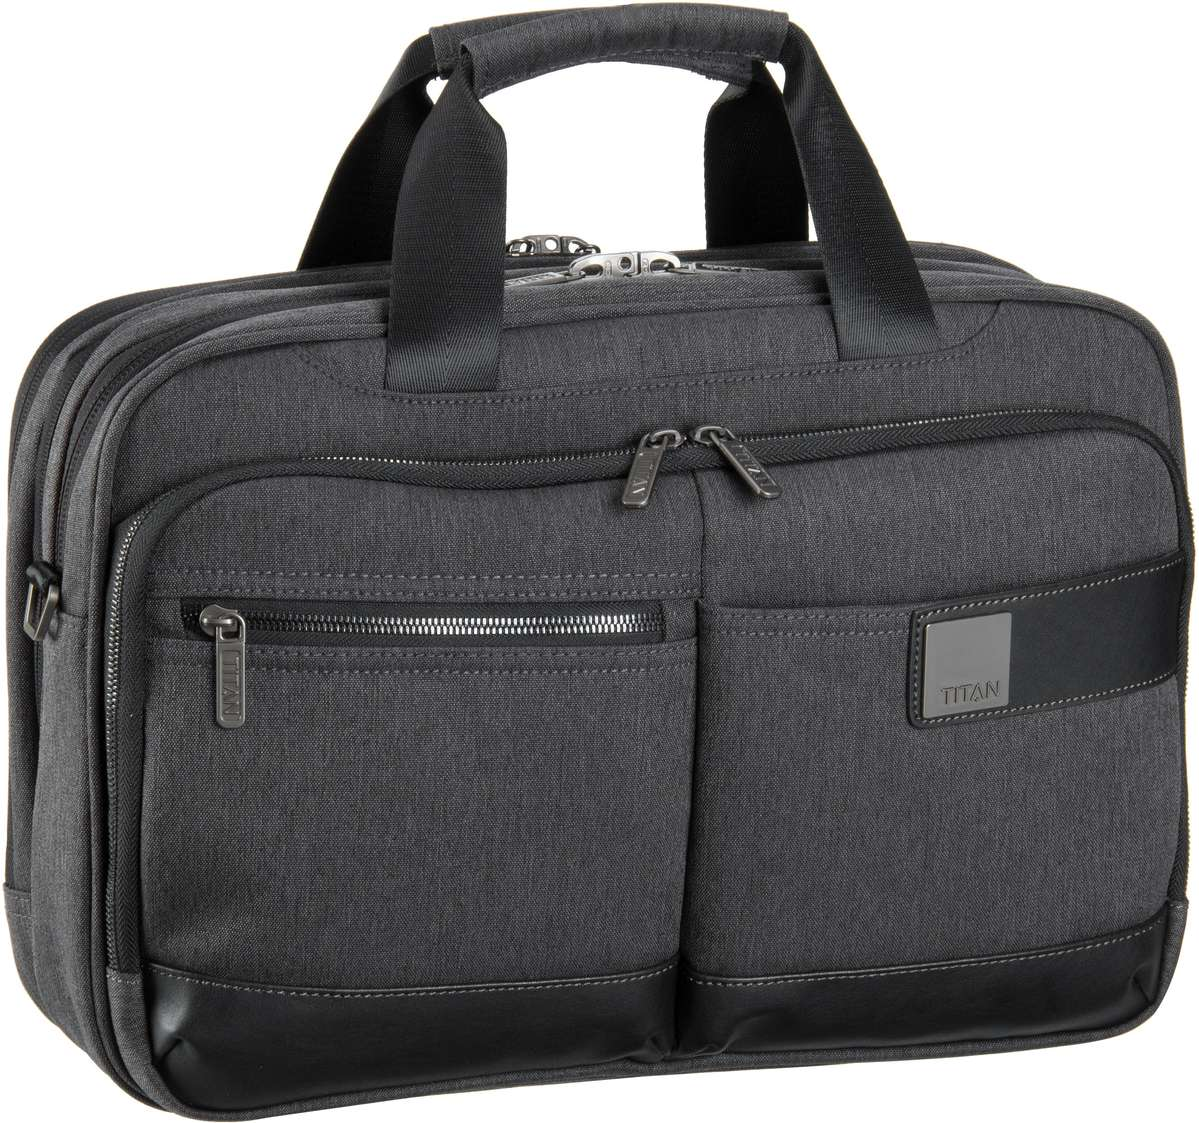 titan power pack laptop bag s preisvergleich. Black Bedroom Furniture Sets. Home Design Ideas